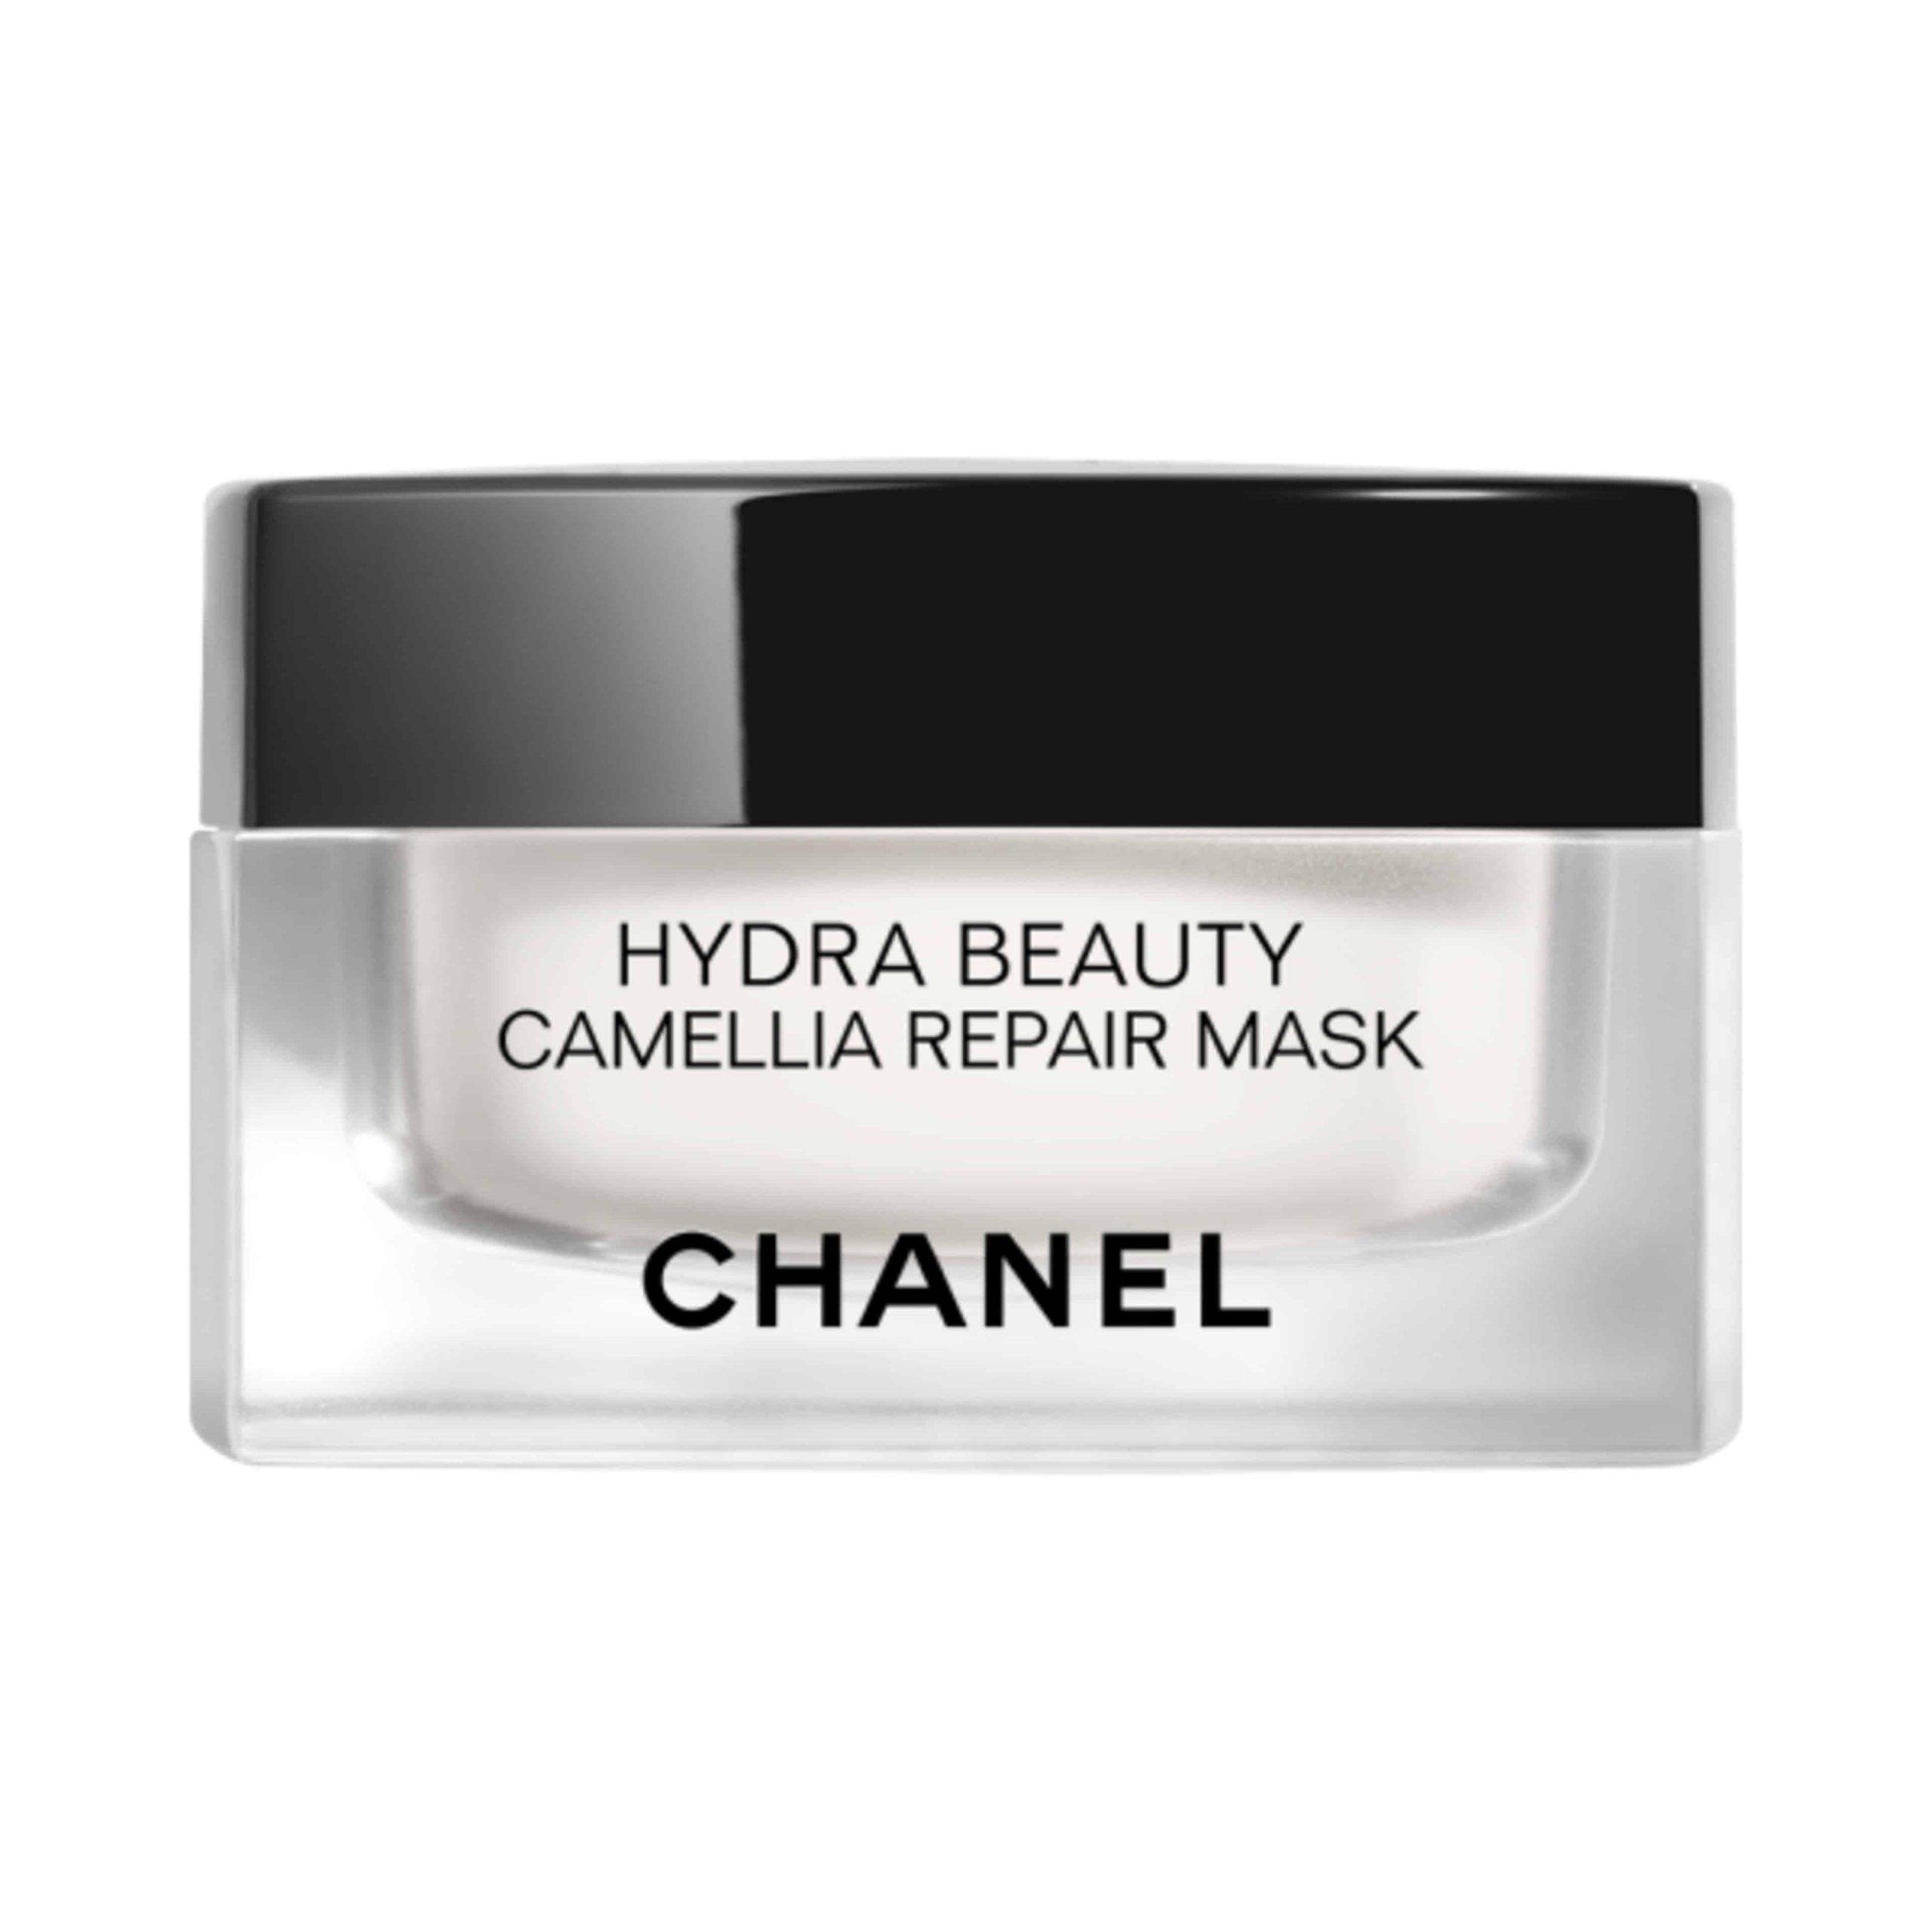 Chanel Hydra Beauty Camellia Repair Mask